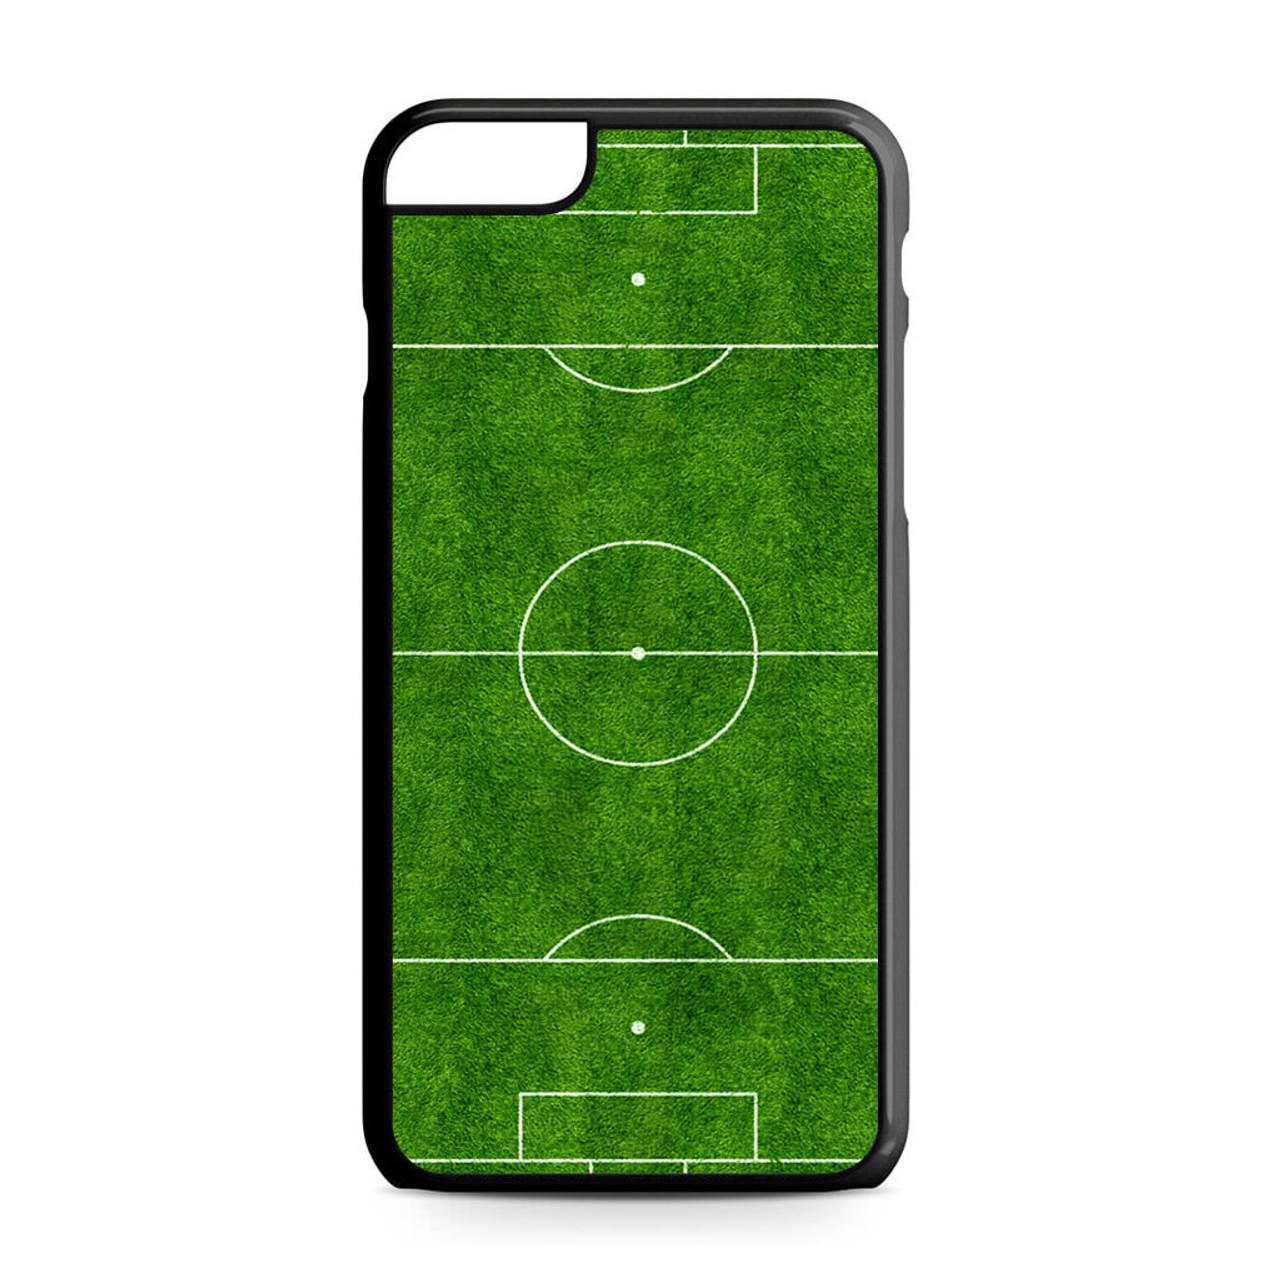 iphone 6s football case